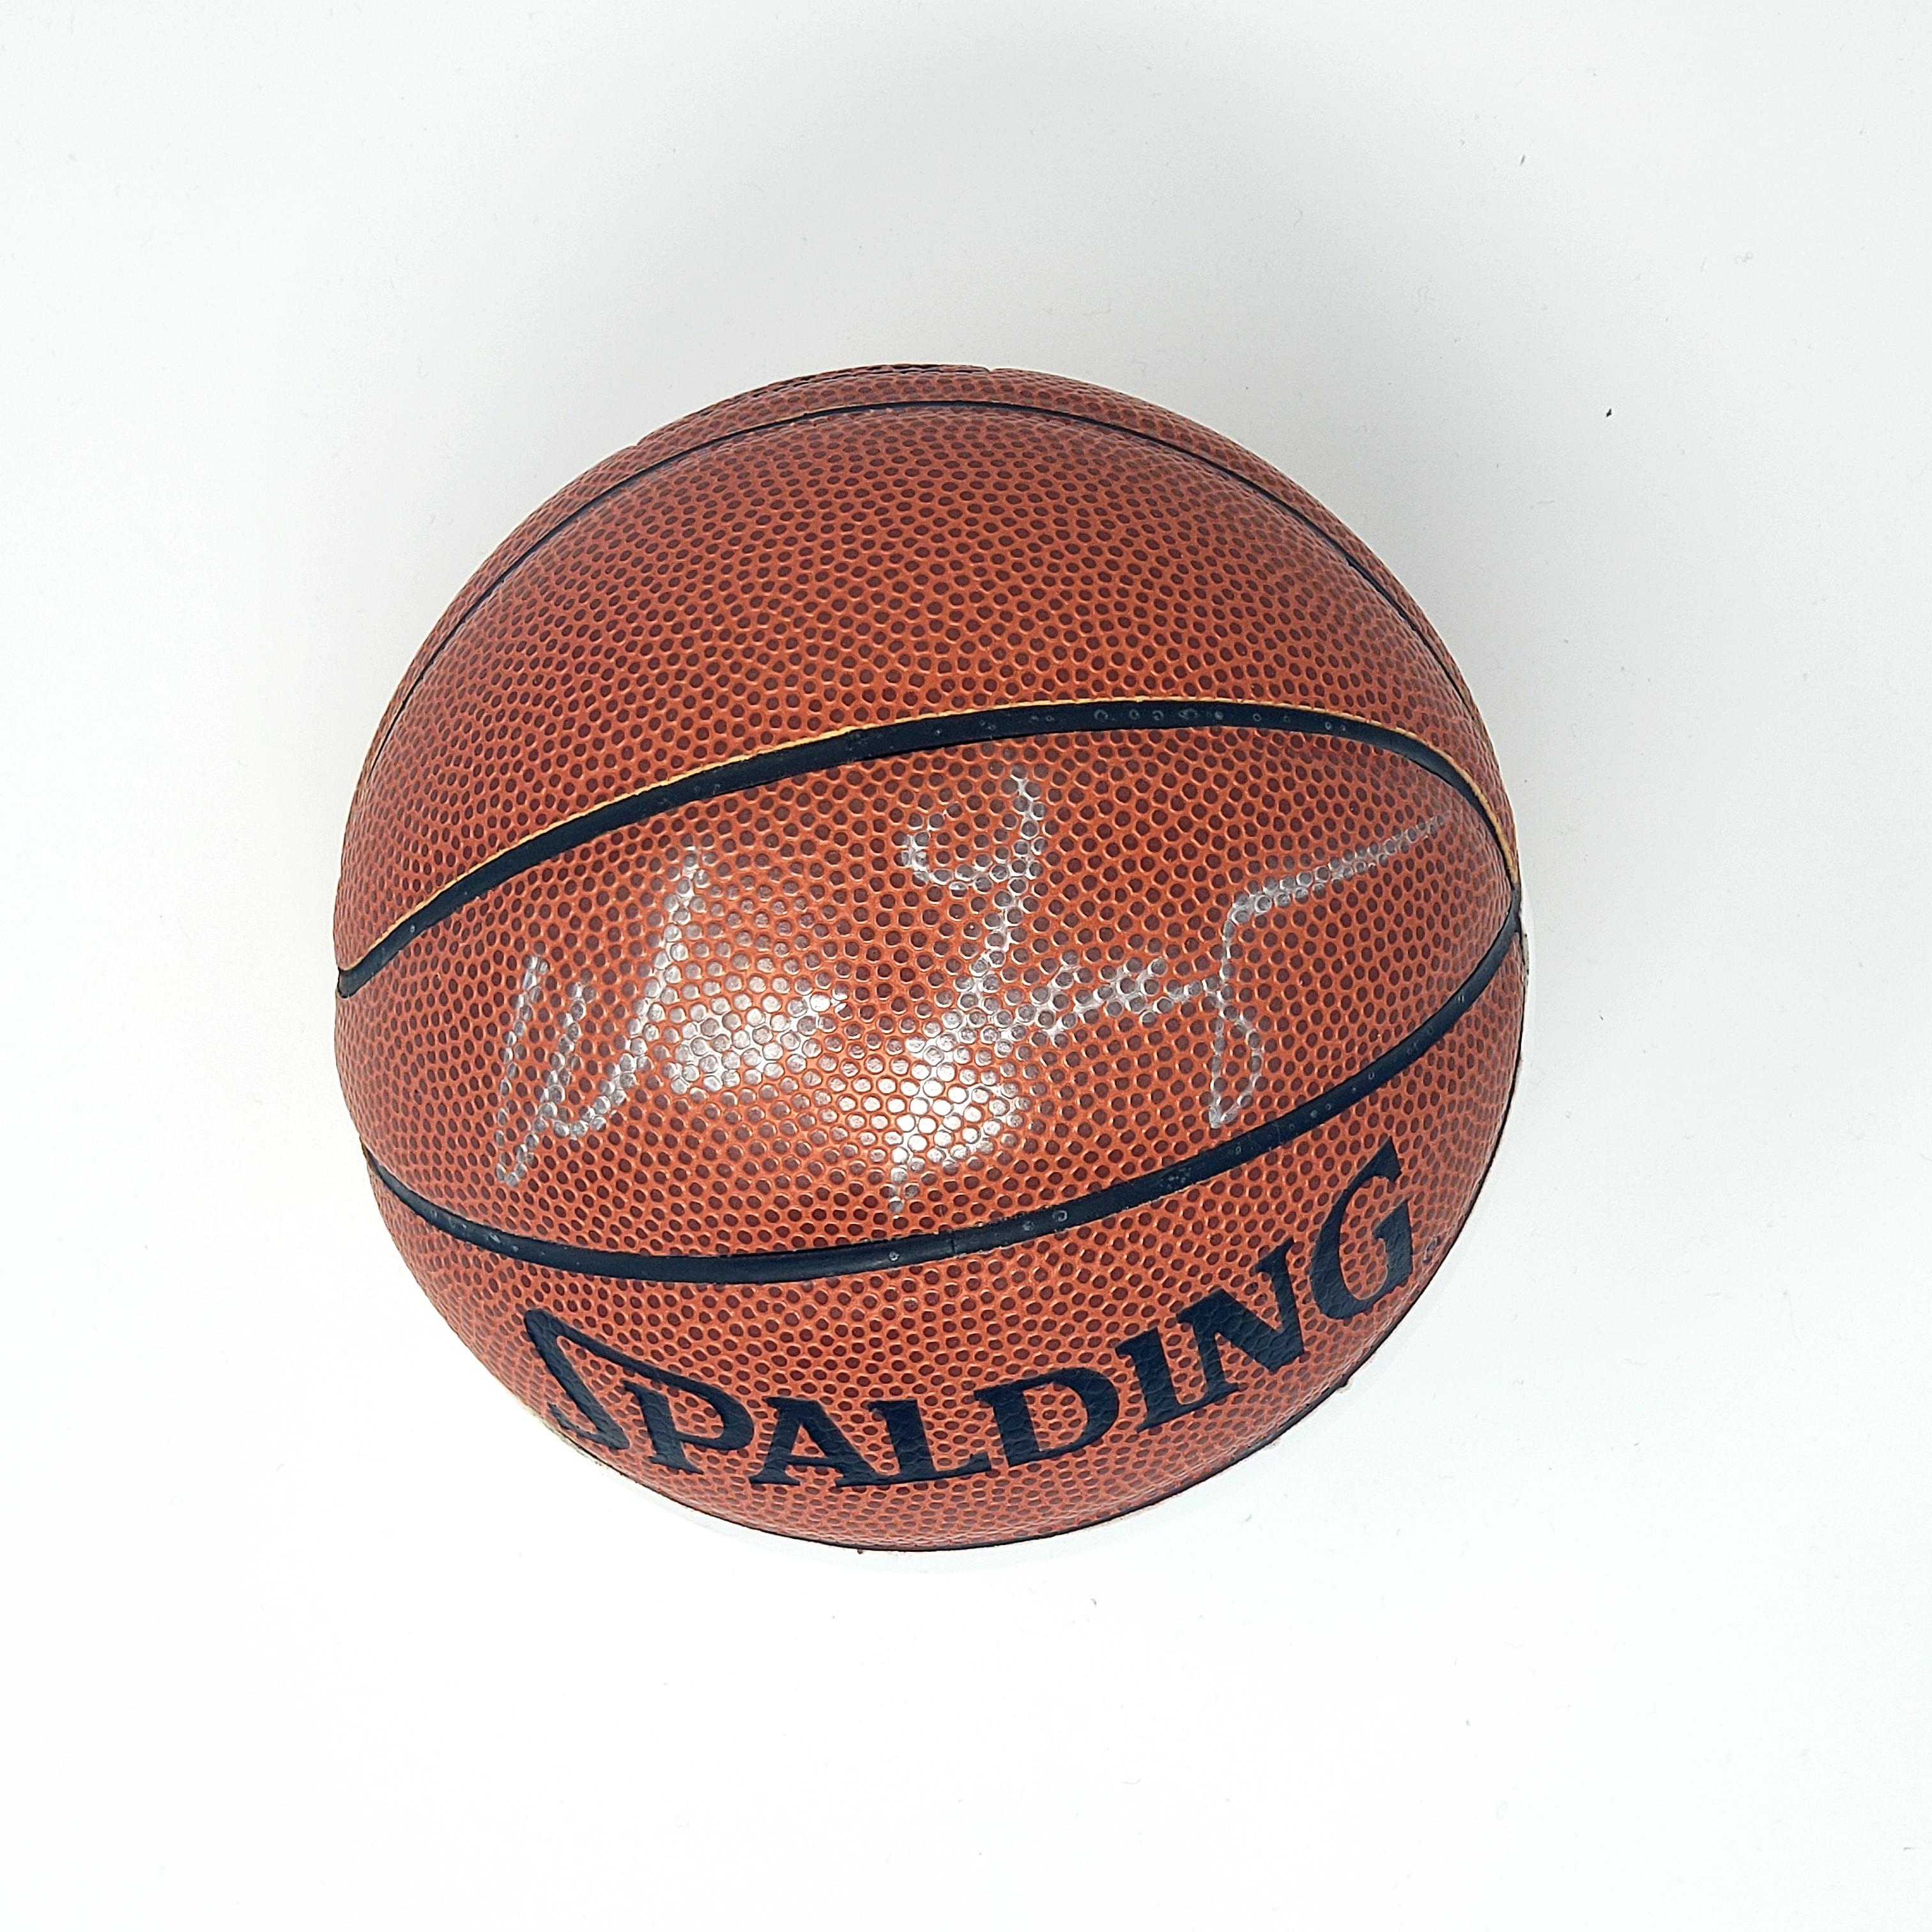 Nba Basketball New York Knicks: Walt Frazier Autographed Mini NBA Store Basketball New